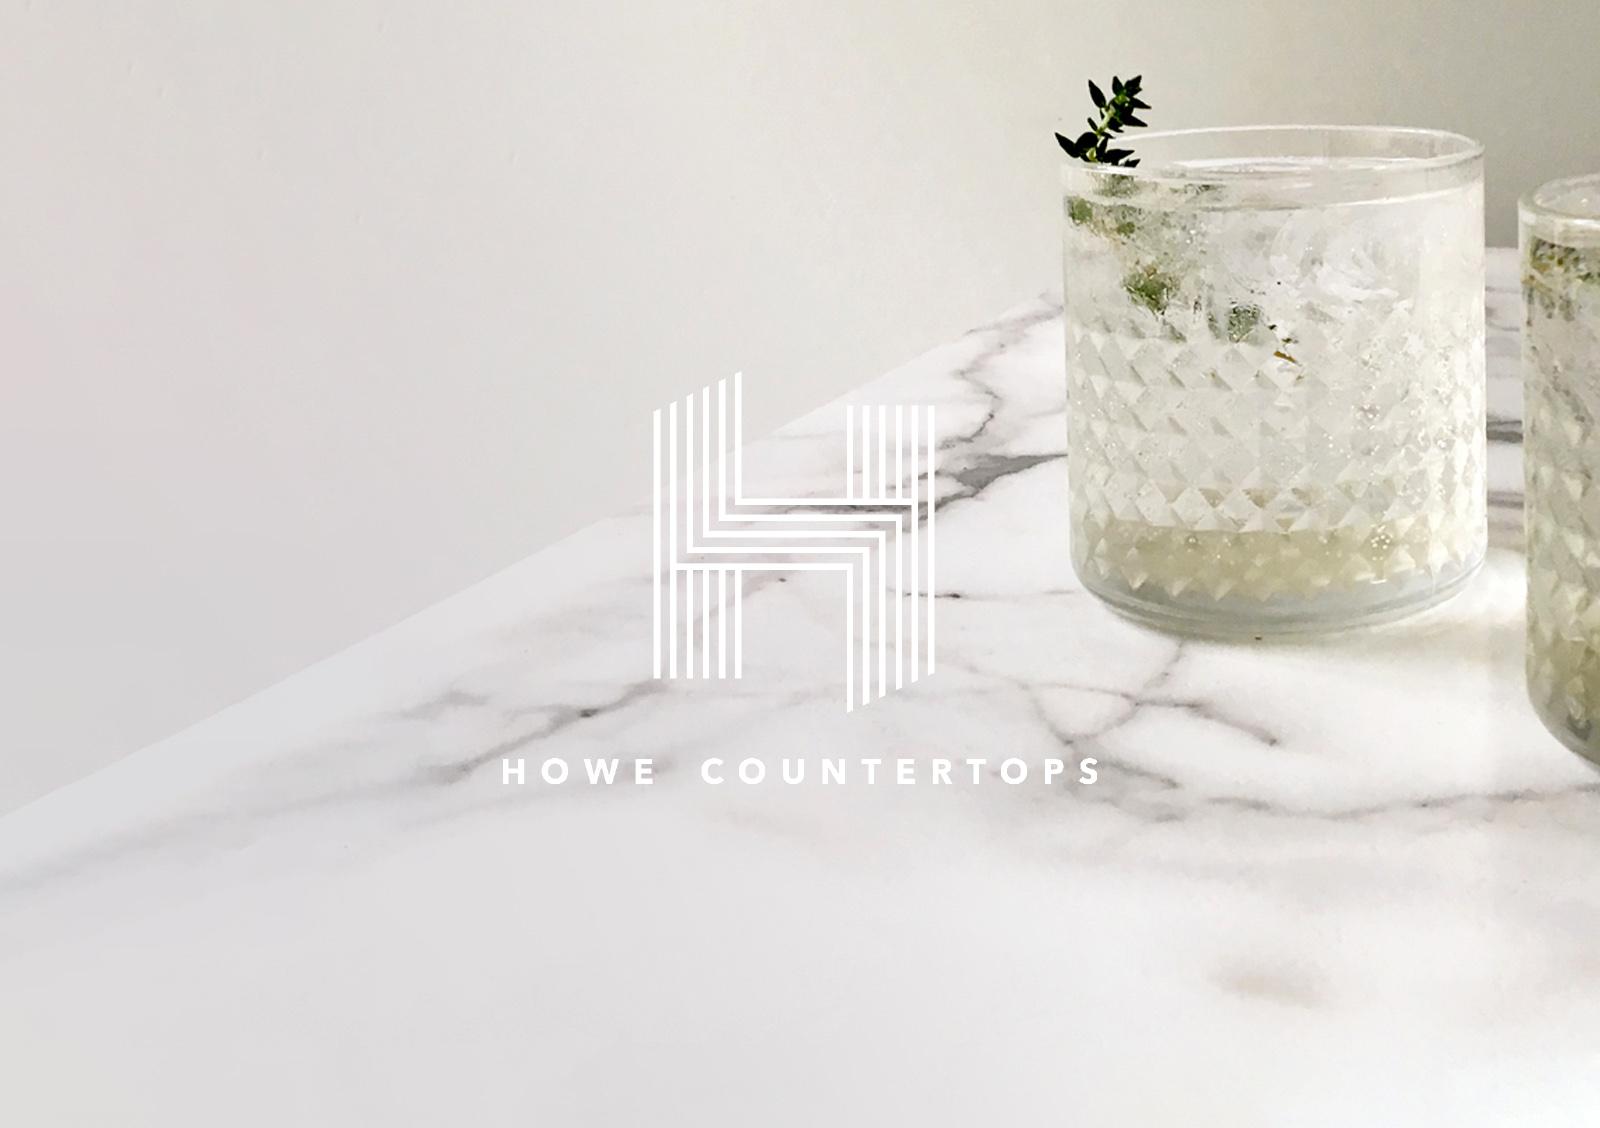 ah-howe-countertops-4